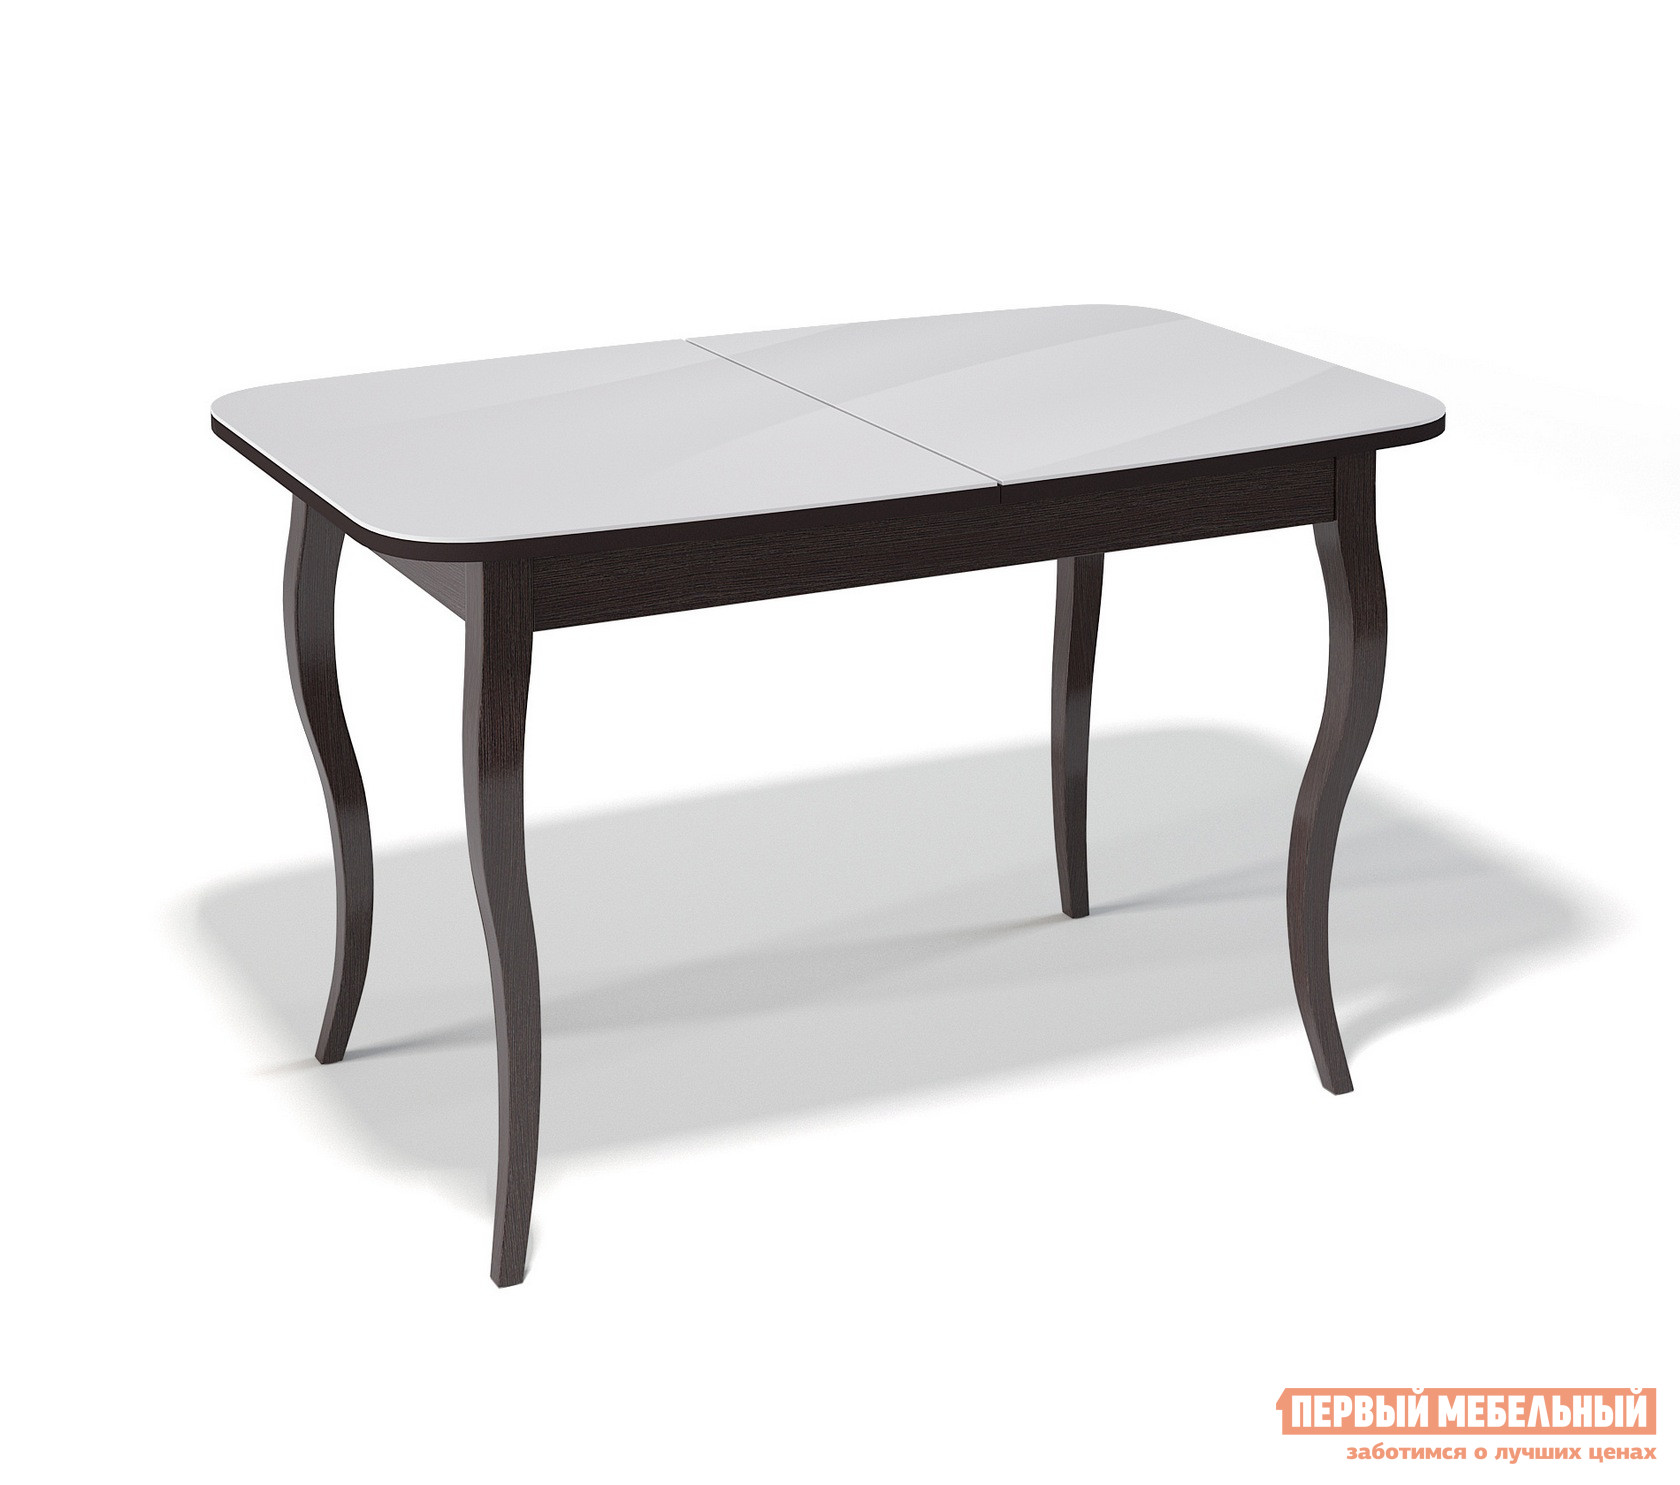 Кухонный стол ДИК KENNER 1200С